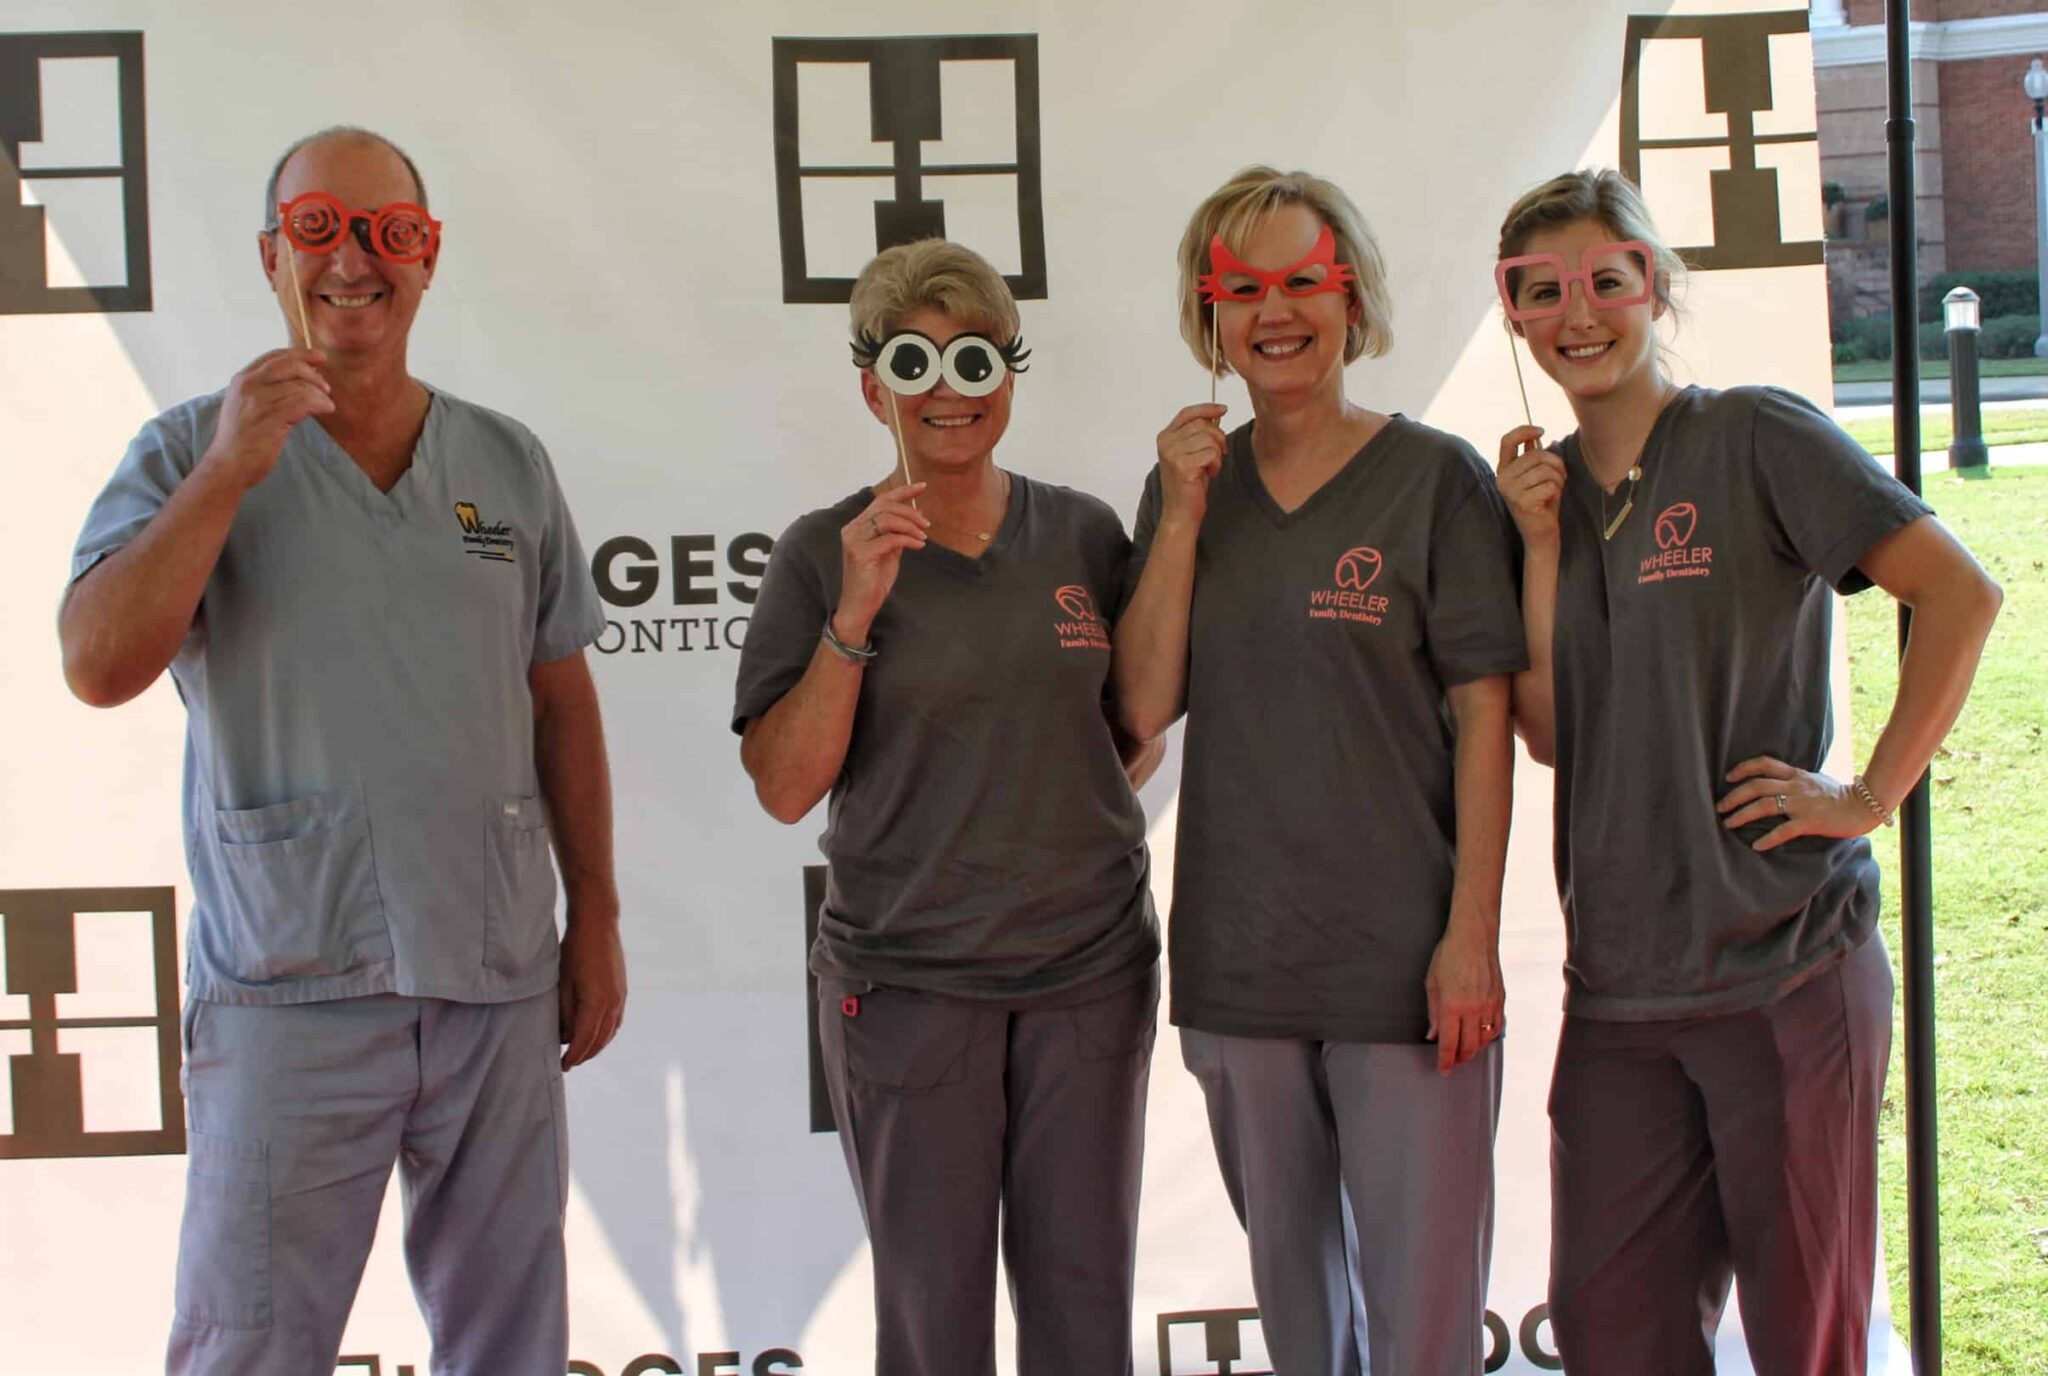 7F204CF5-0B59-4E1D-B697-93D14C764FC5 2019 Hodges Orthodontics BBQ